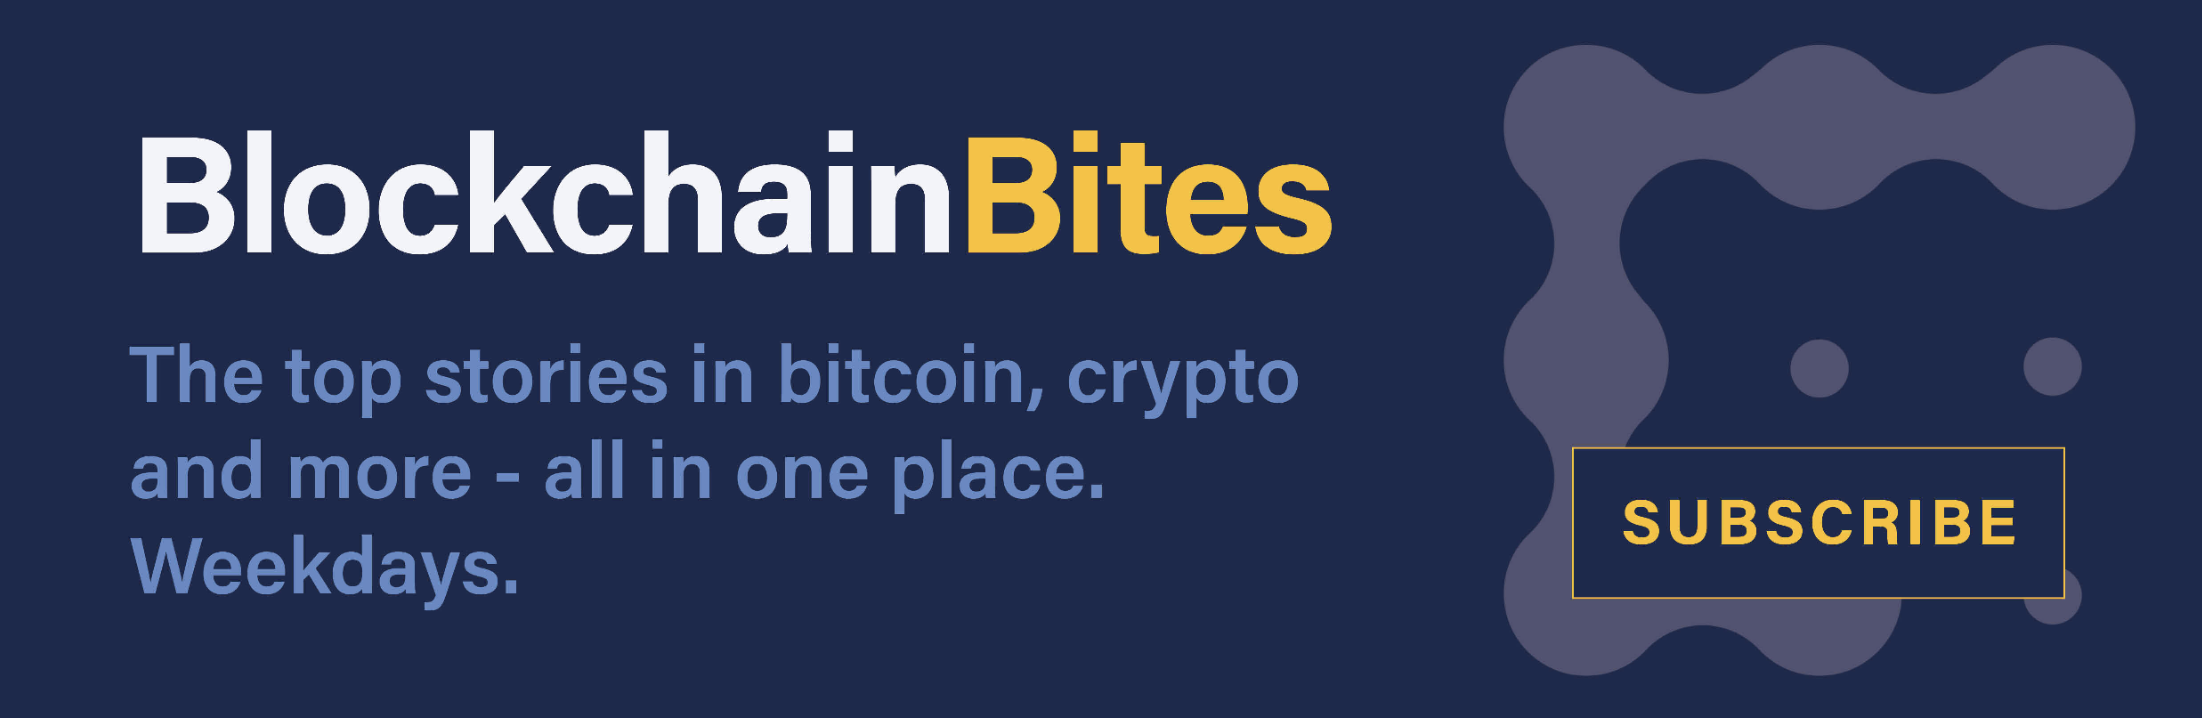 Blockchain Bites Ethereum's Economy, Estonia's CBDC Research ...